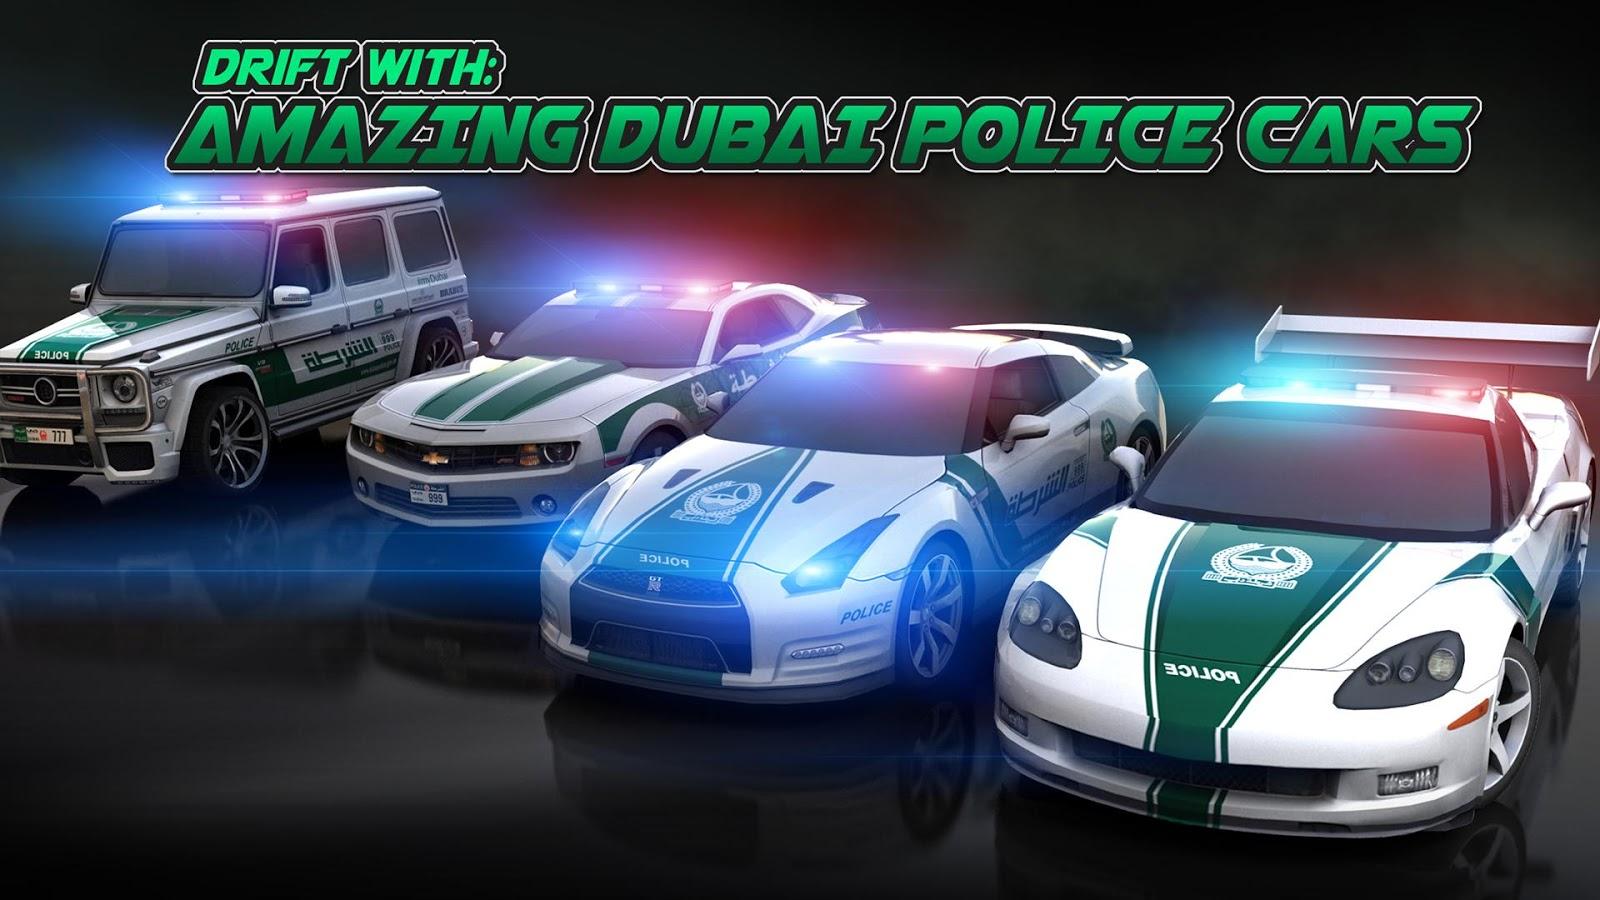 Dubai racing no wifi games for android phone